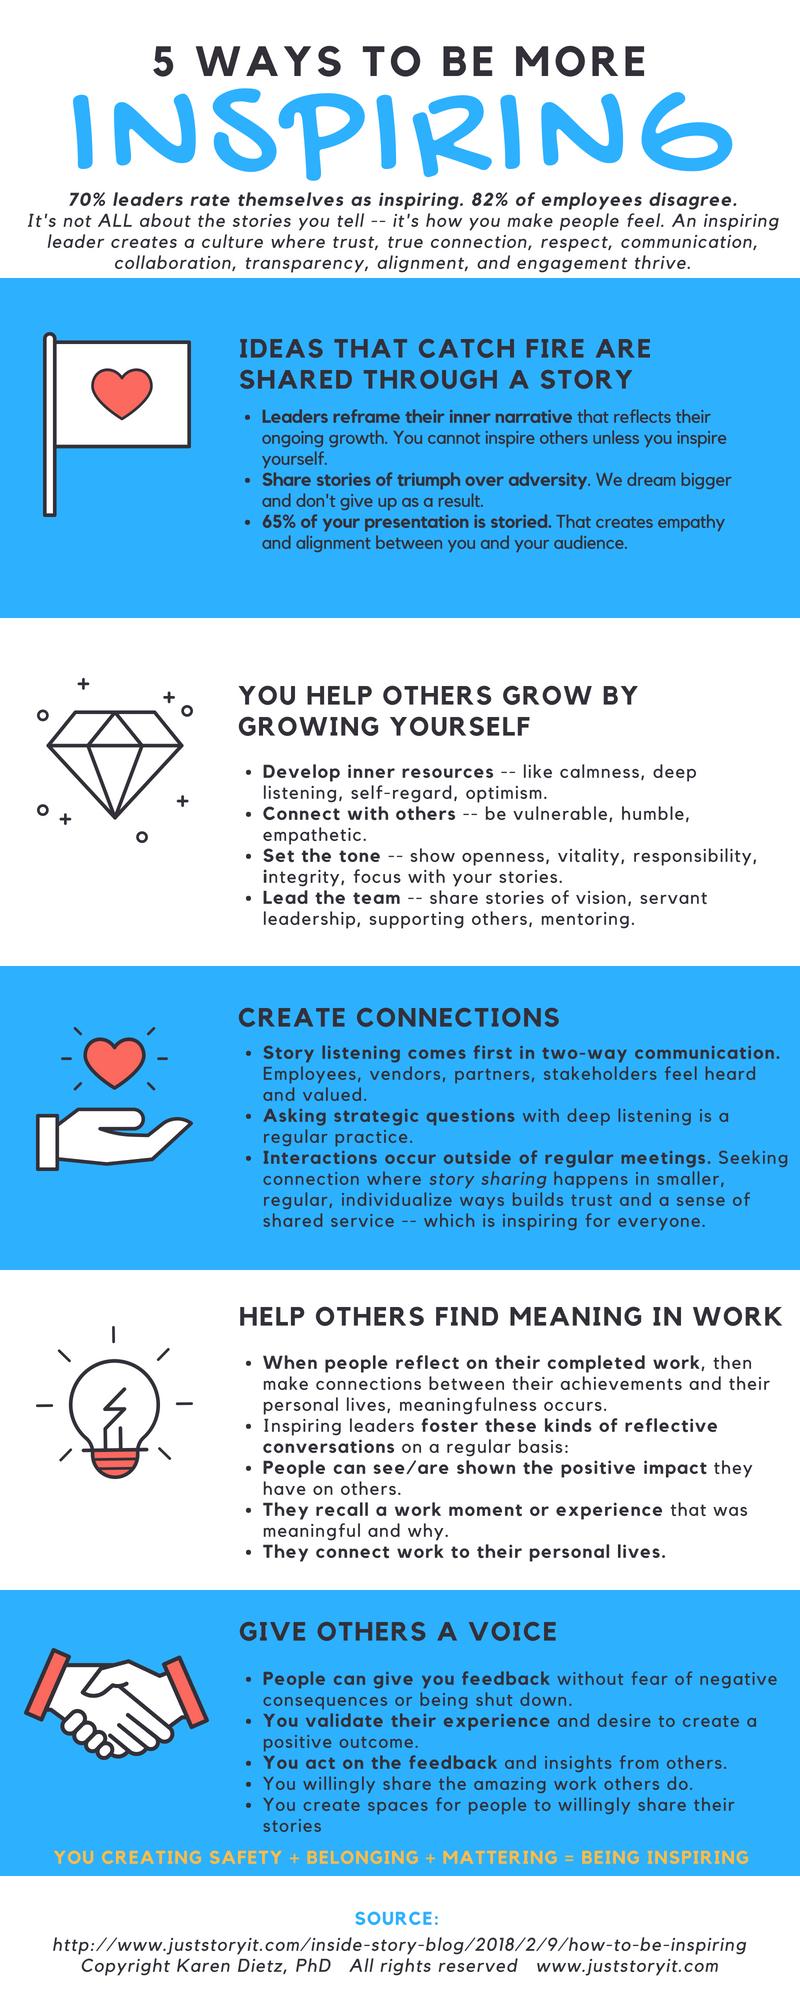 5 Ways To Be Inspiring.png